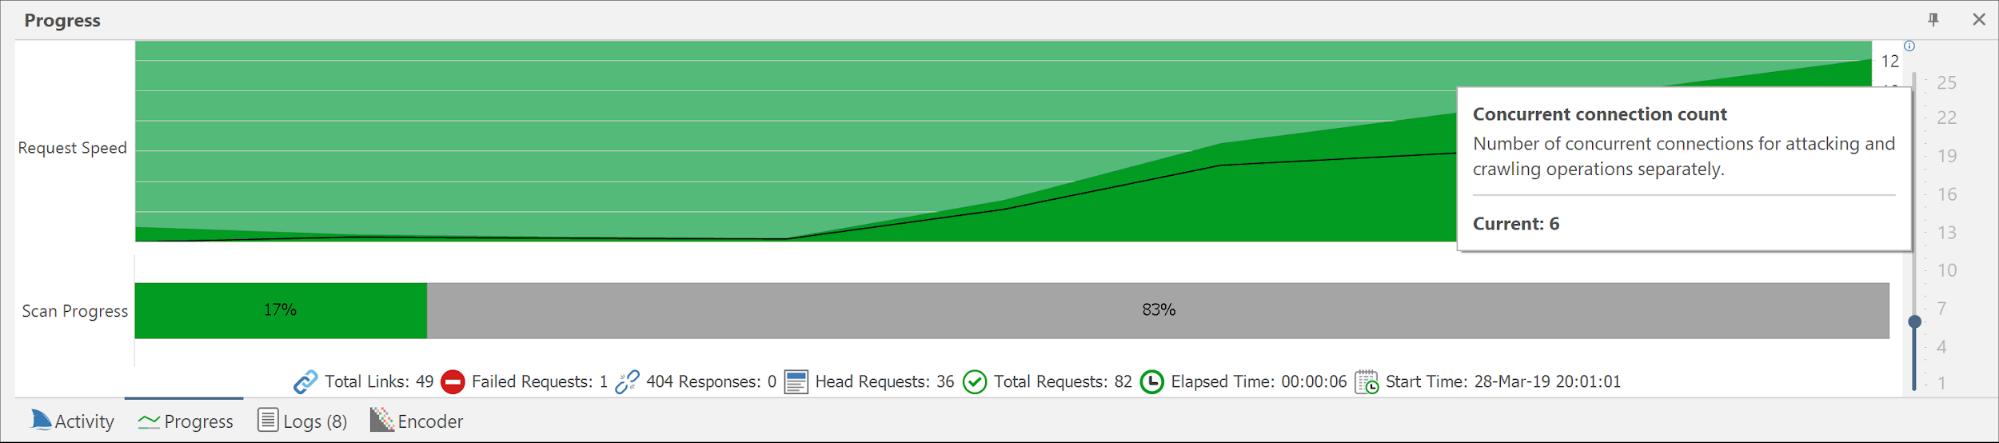 Netsparker 5 3 – Performance Upgrades | Netsparker